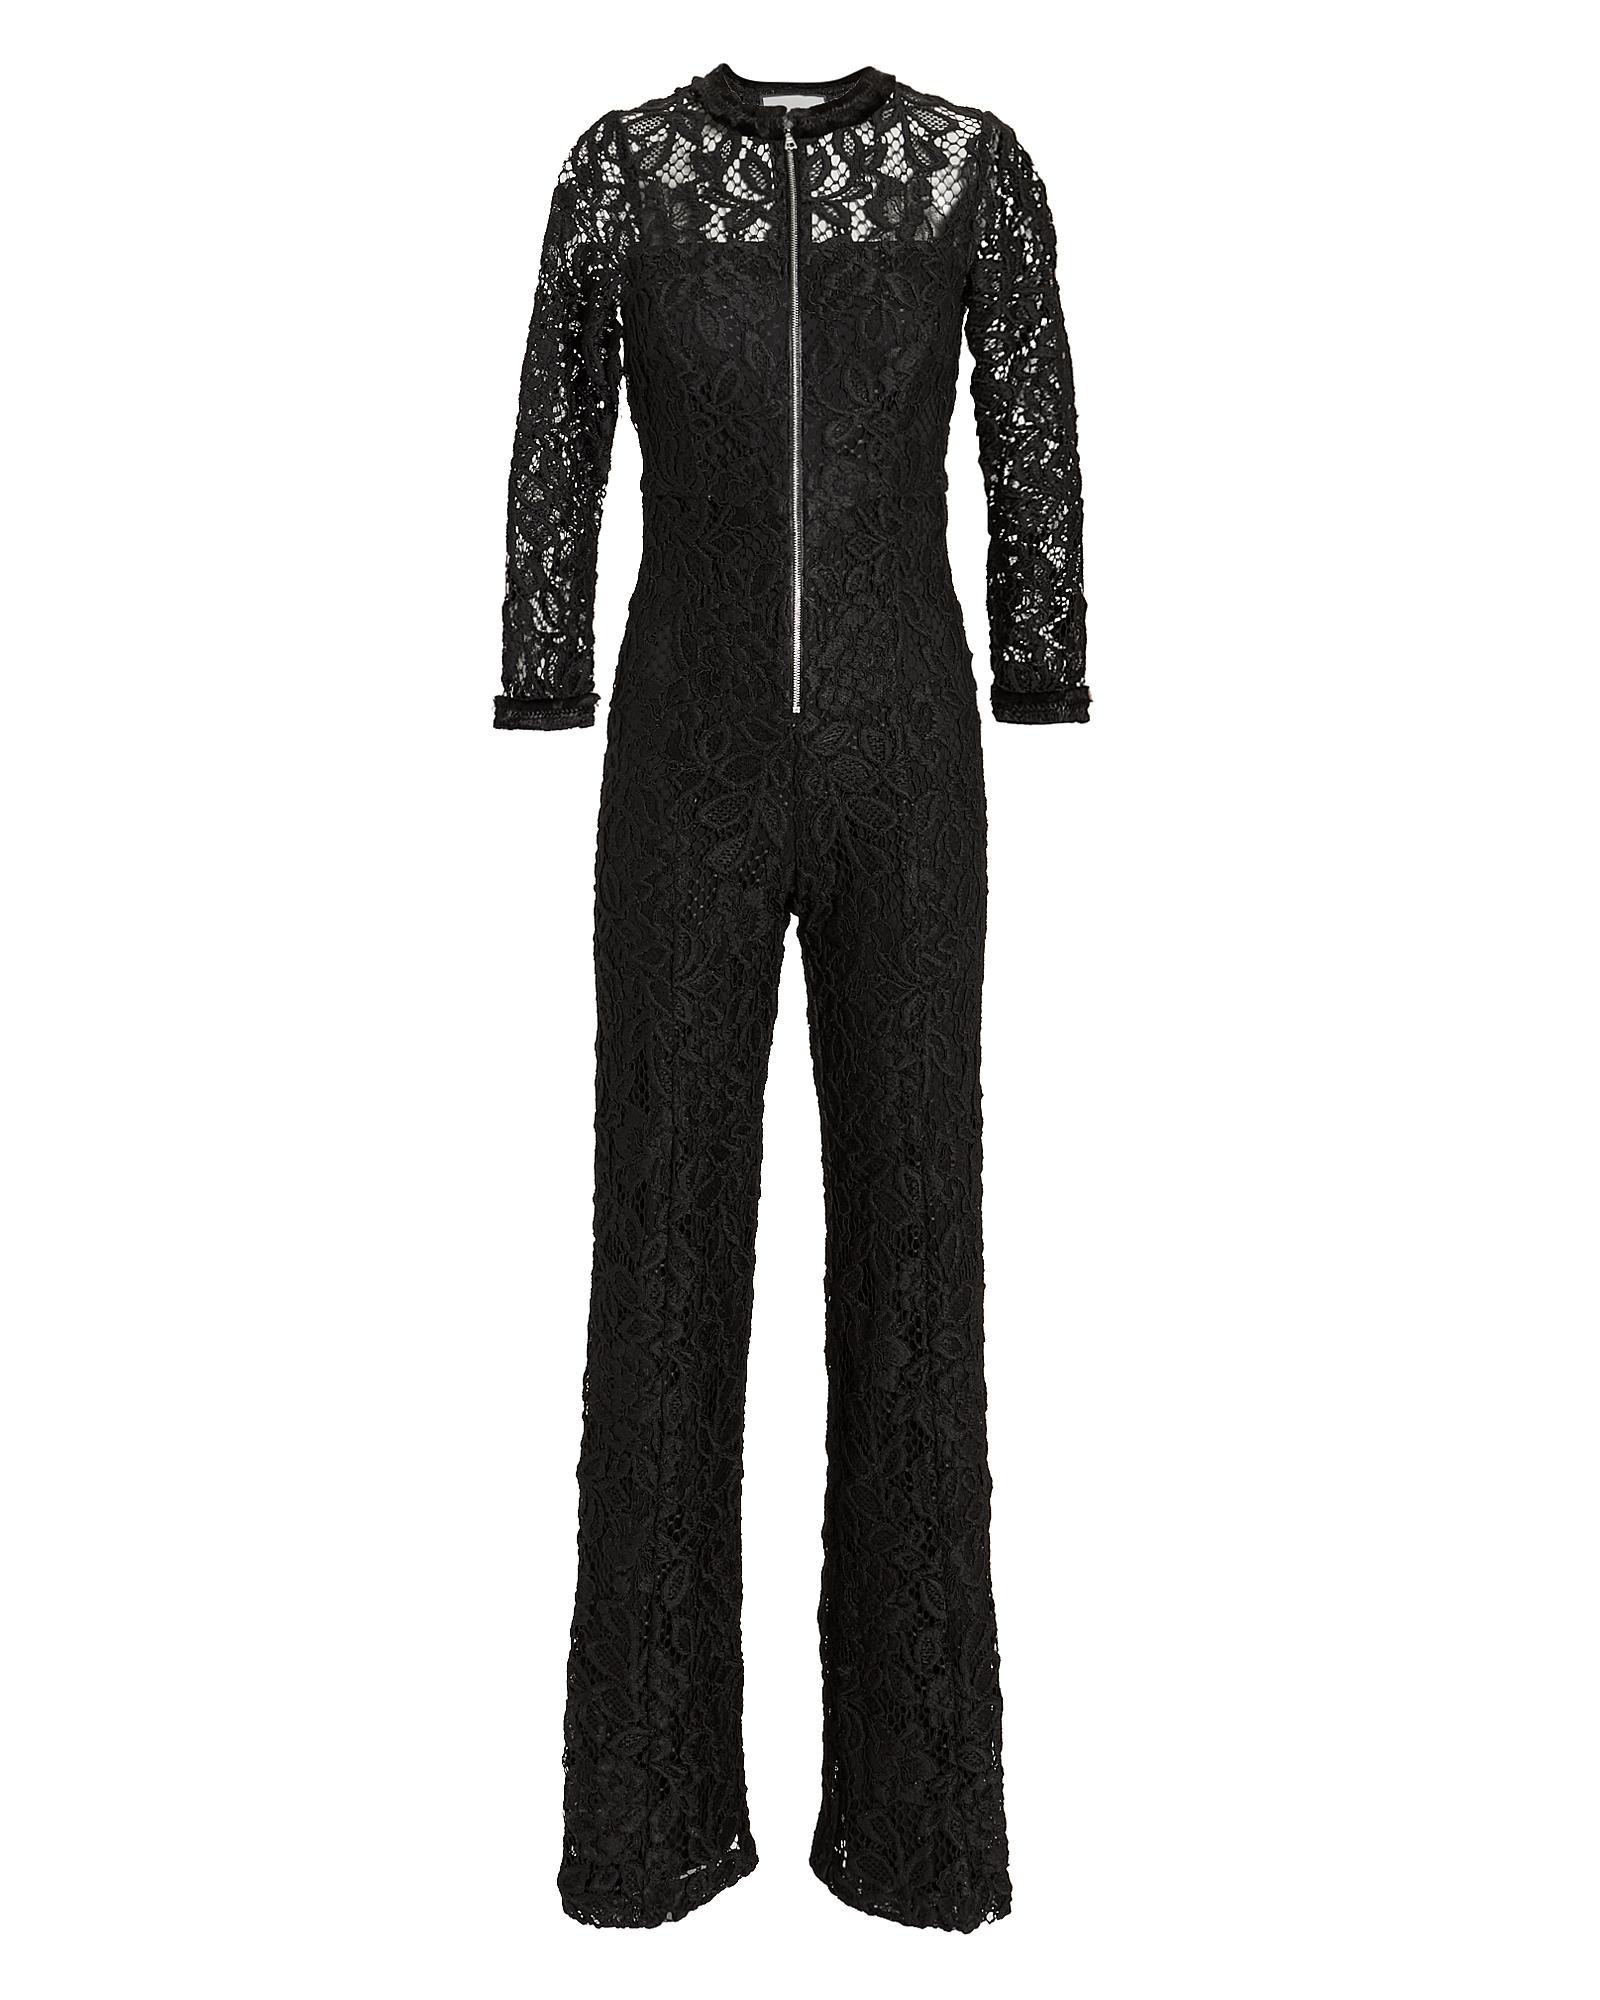 Emaya Lace 3/4-Sleeve Wide-Leg Jumpsuit in Black